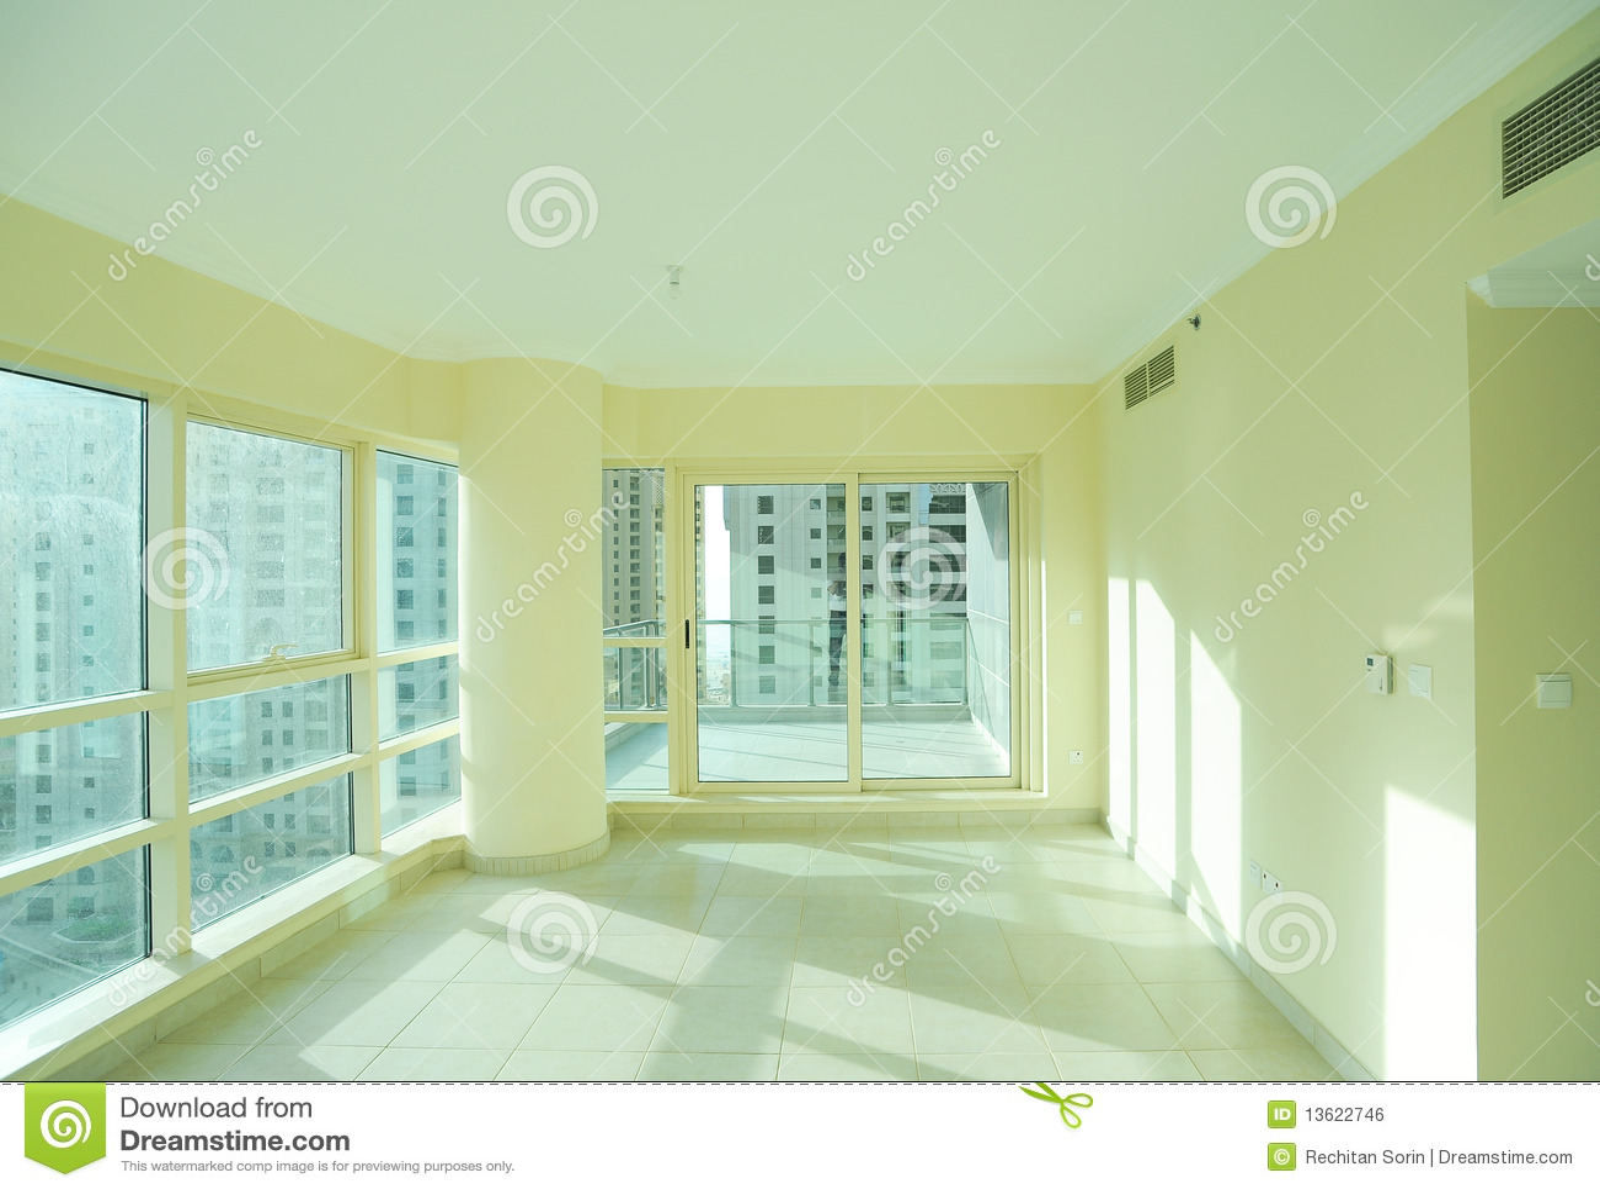 Interior Design Royalty Free Stock Image Image 13622746